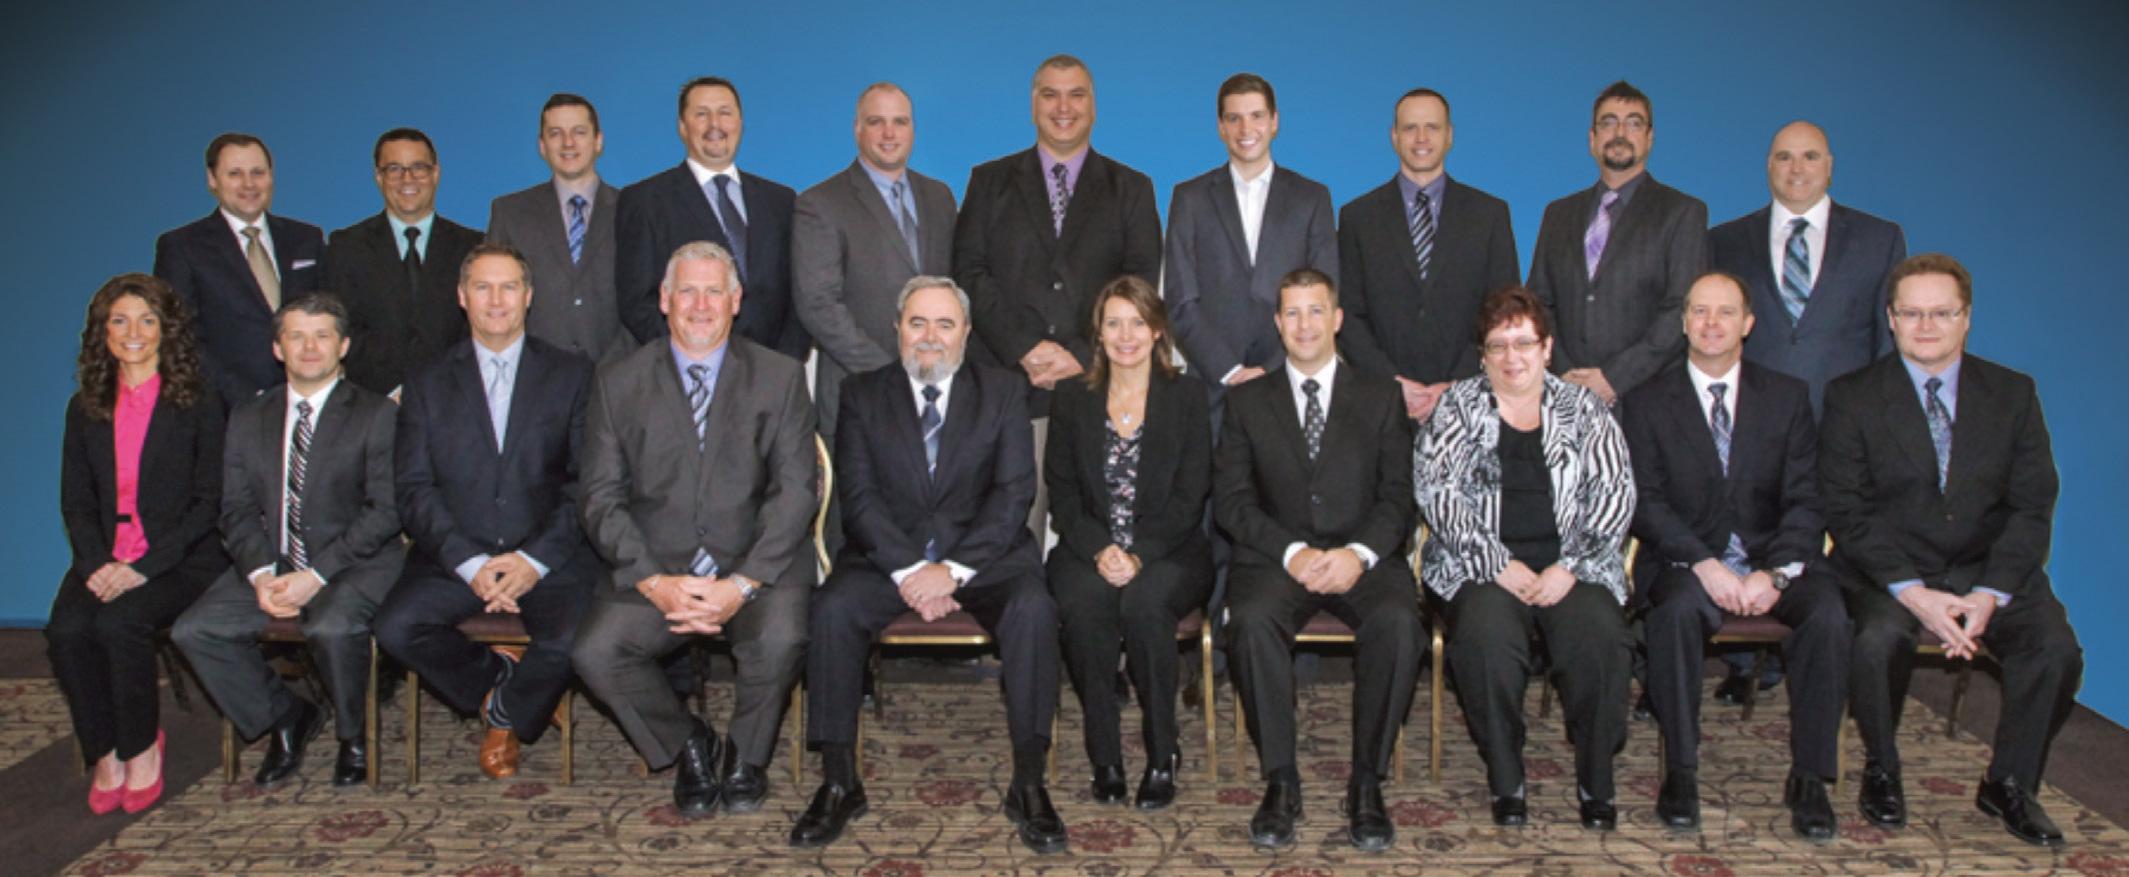 Newfoundland and Labrador Construction Association Board of Directors